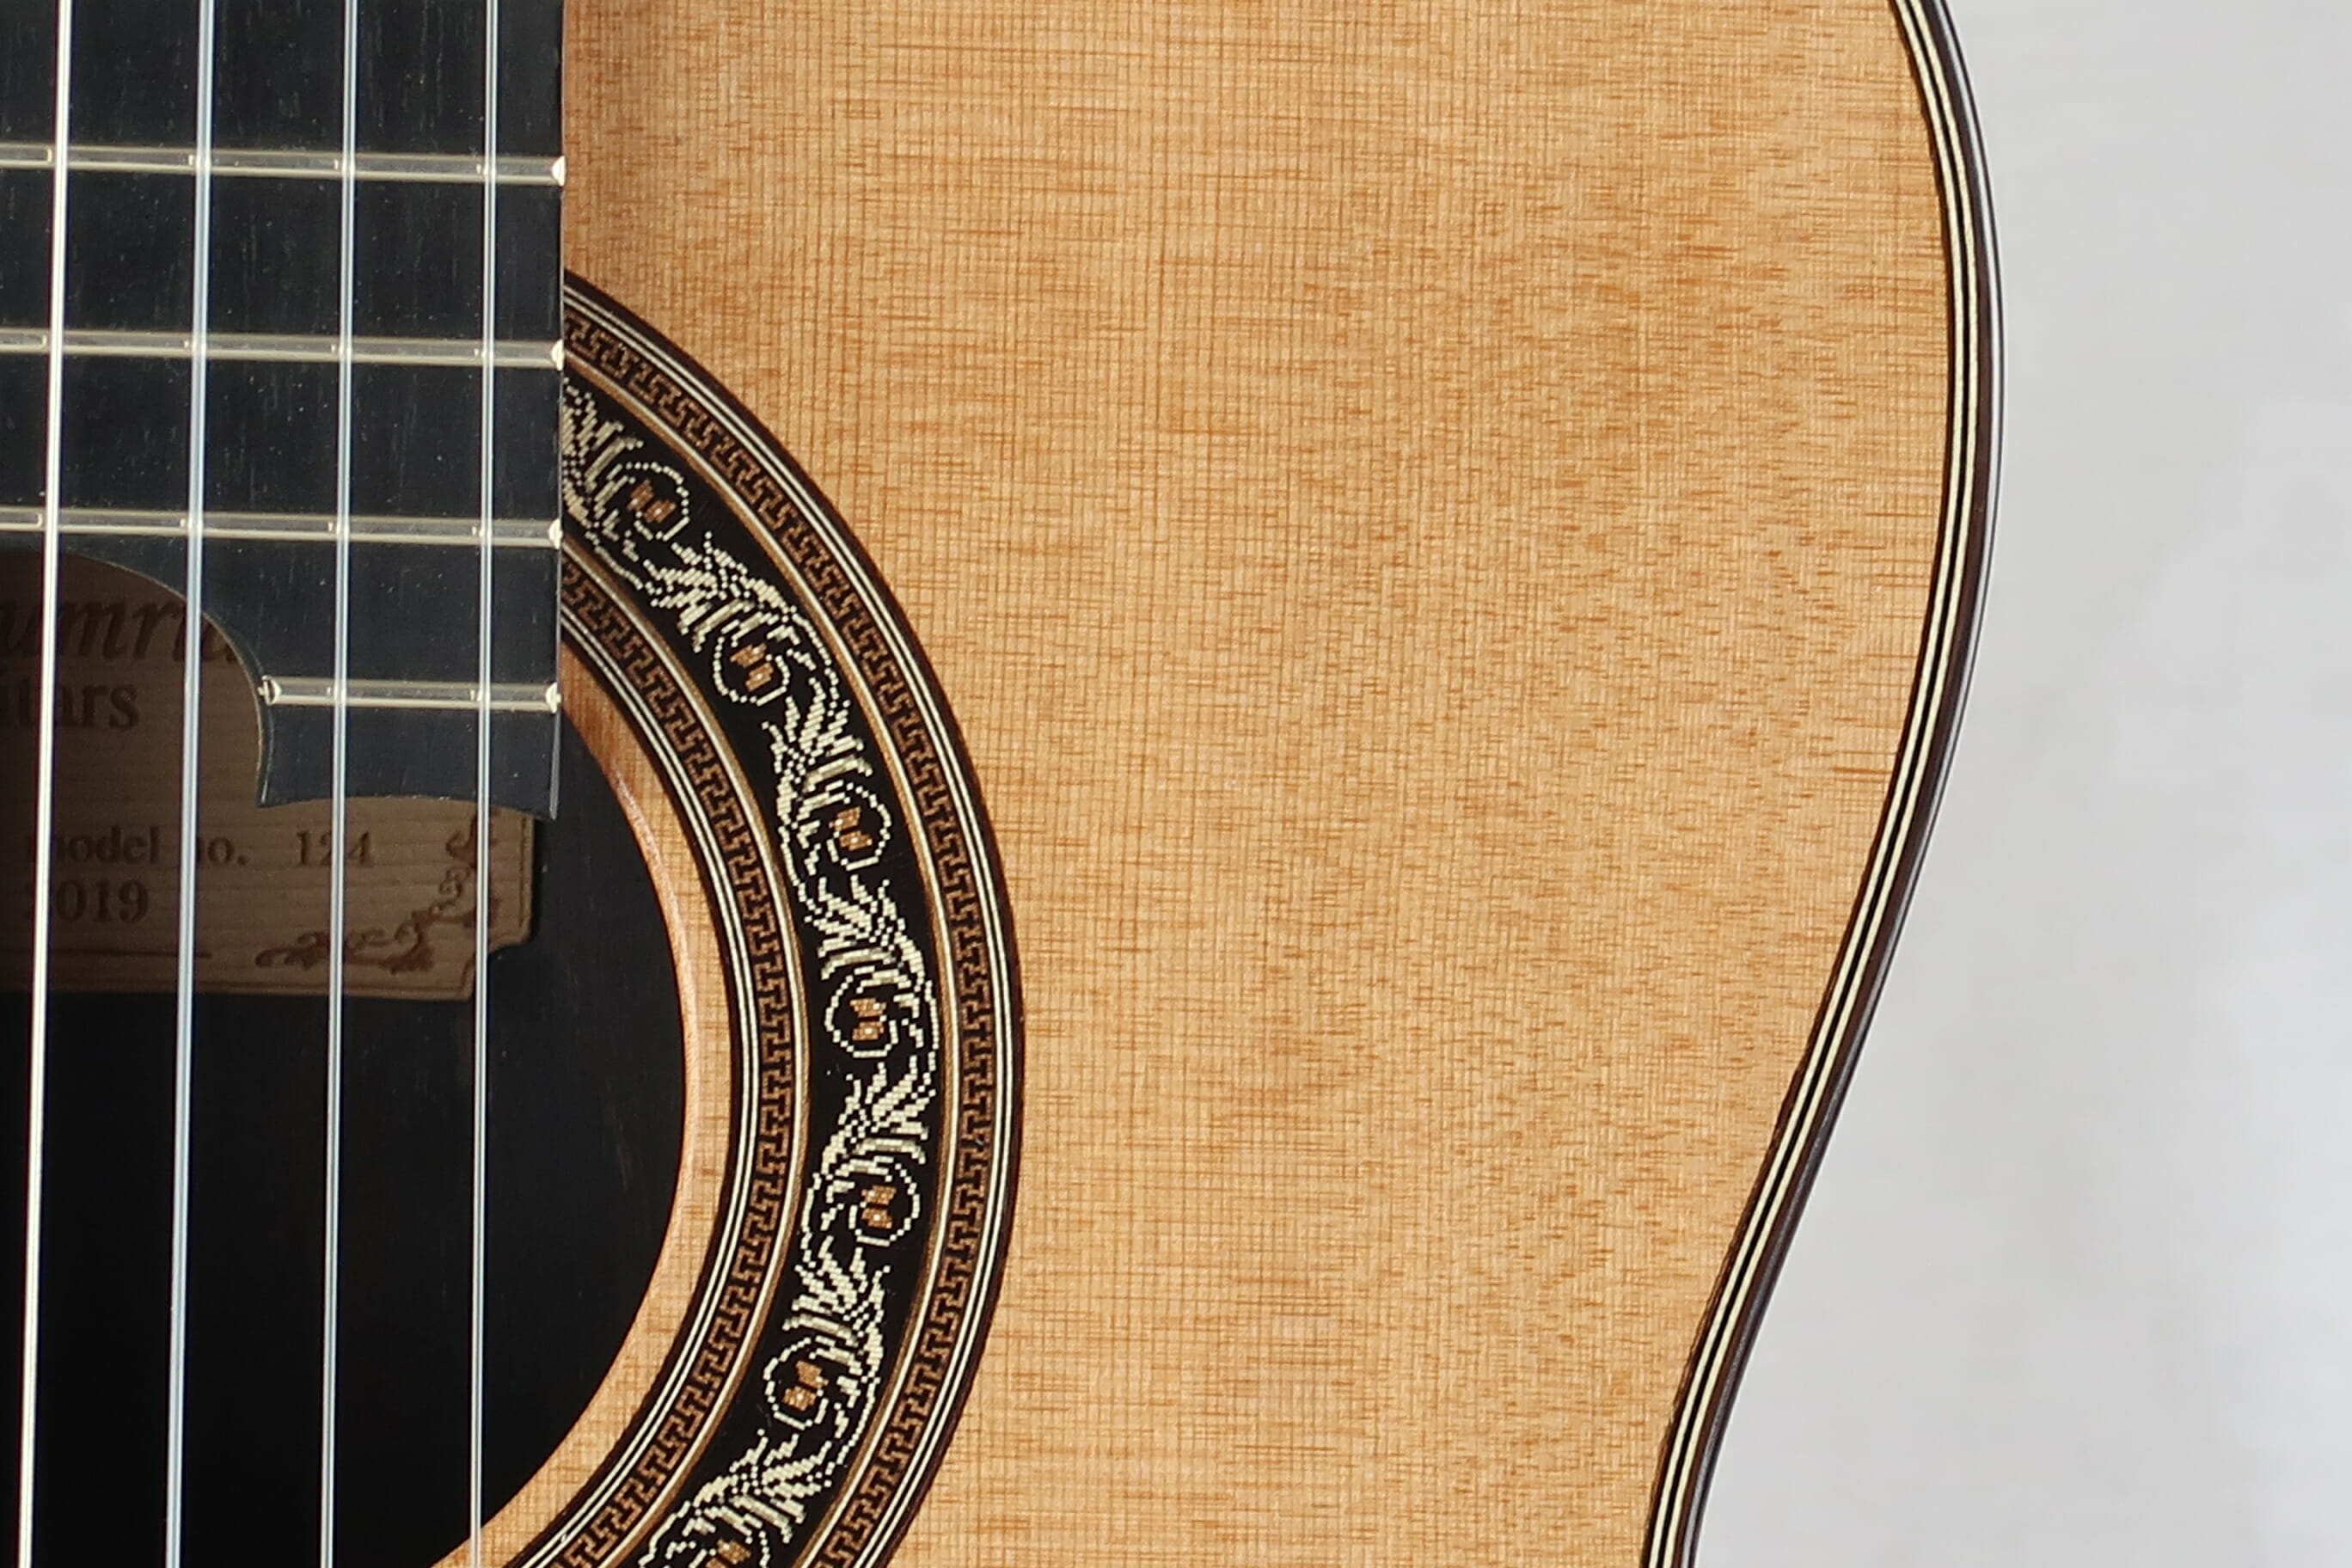 Guitare classique luthier Charalampos Koumridis barrage lattice No 124 19KOU124-07